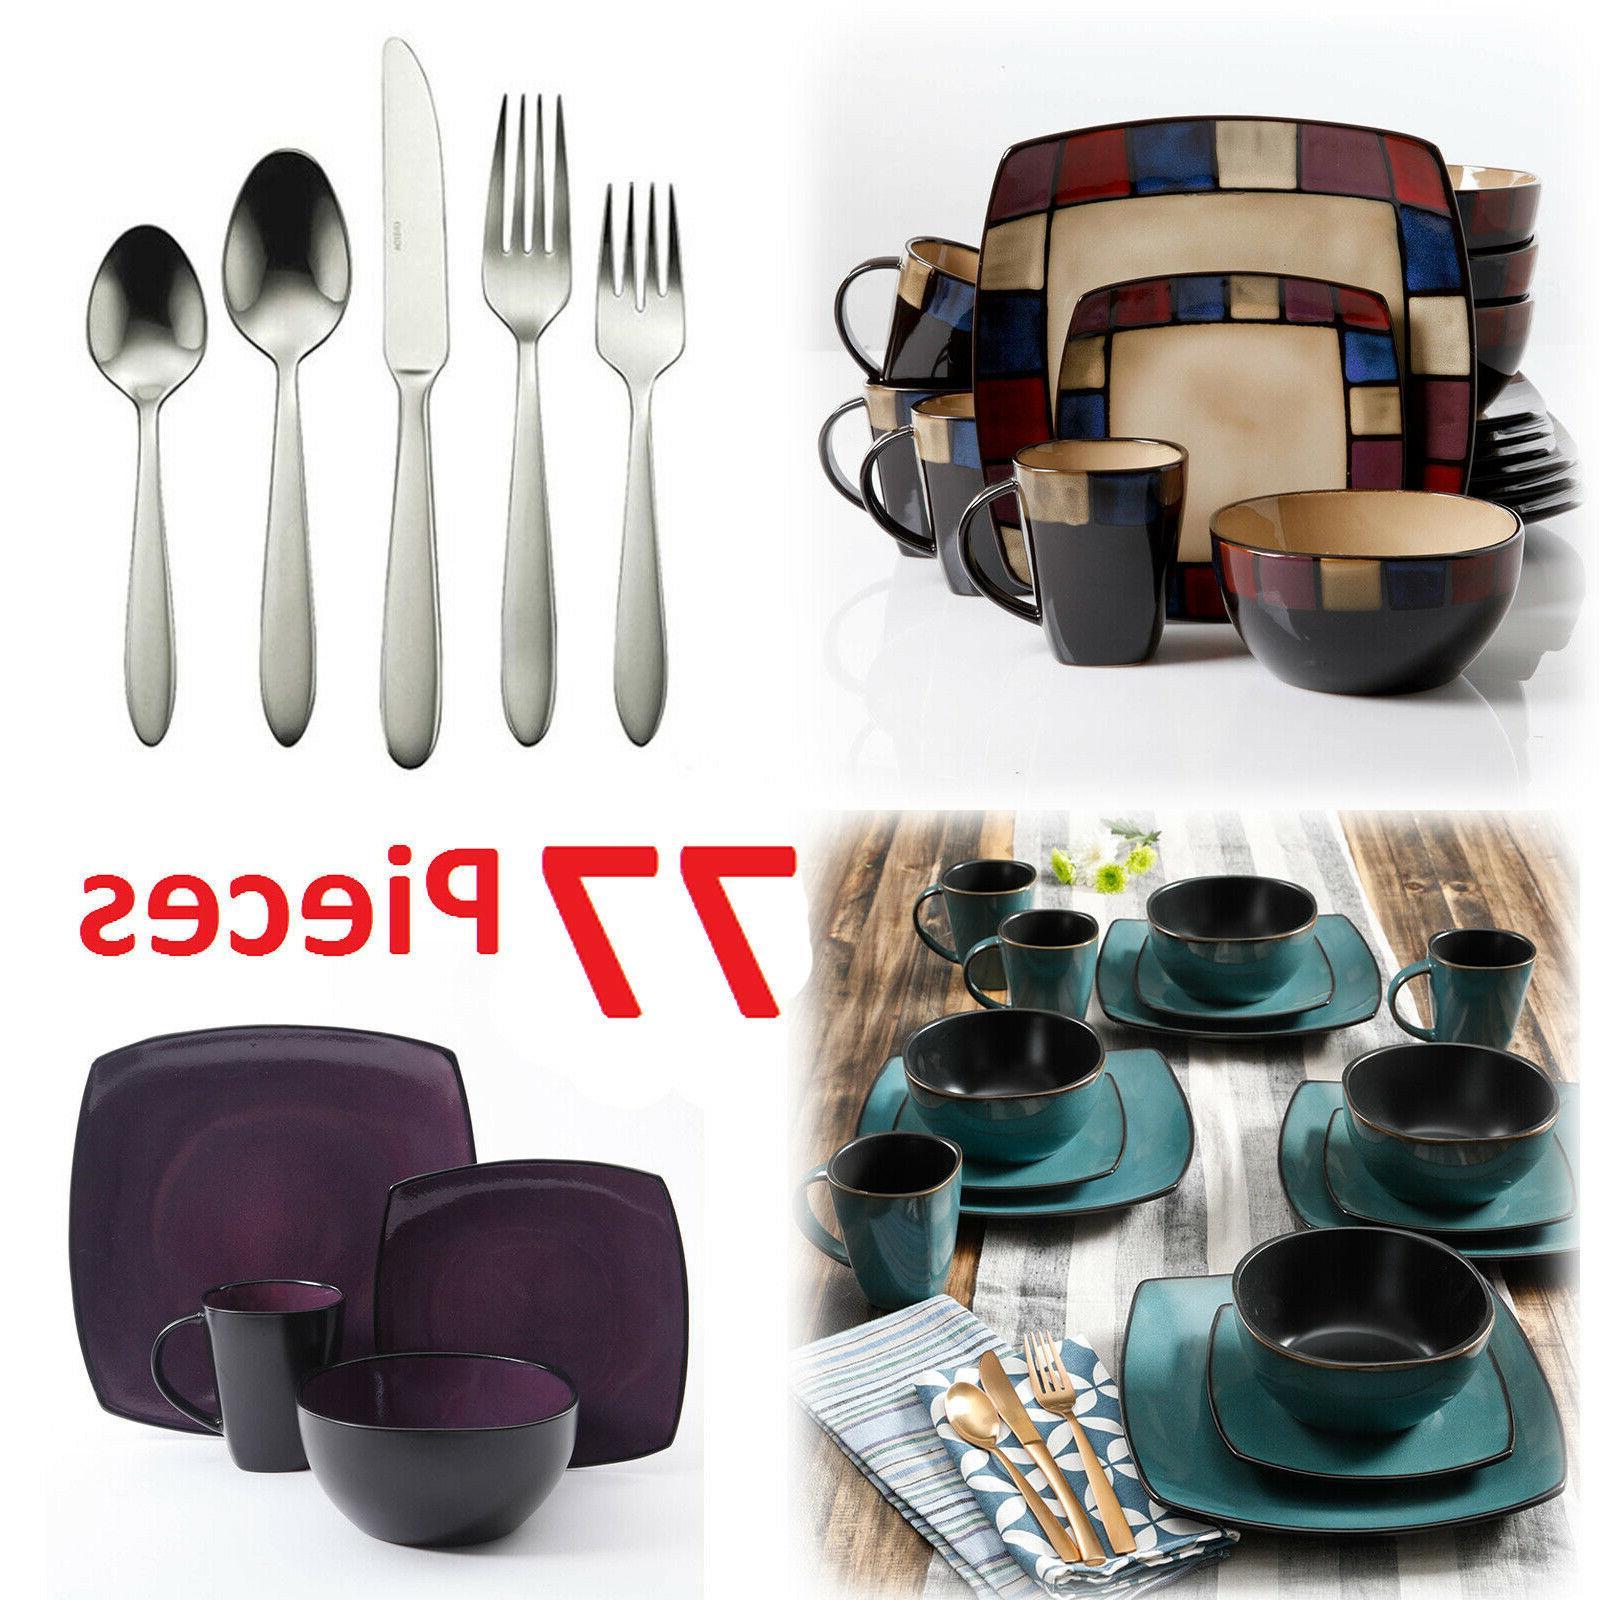 Square Dinnerware Set For 8 77Pcs Stoneware Kitchen 32Pc Pla